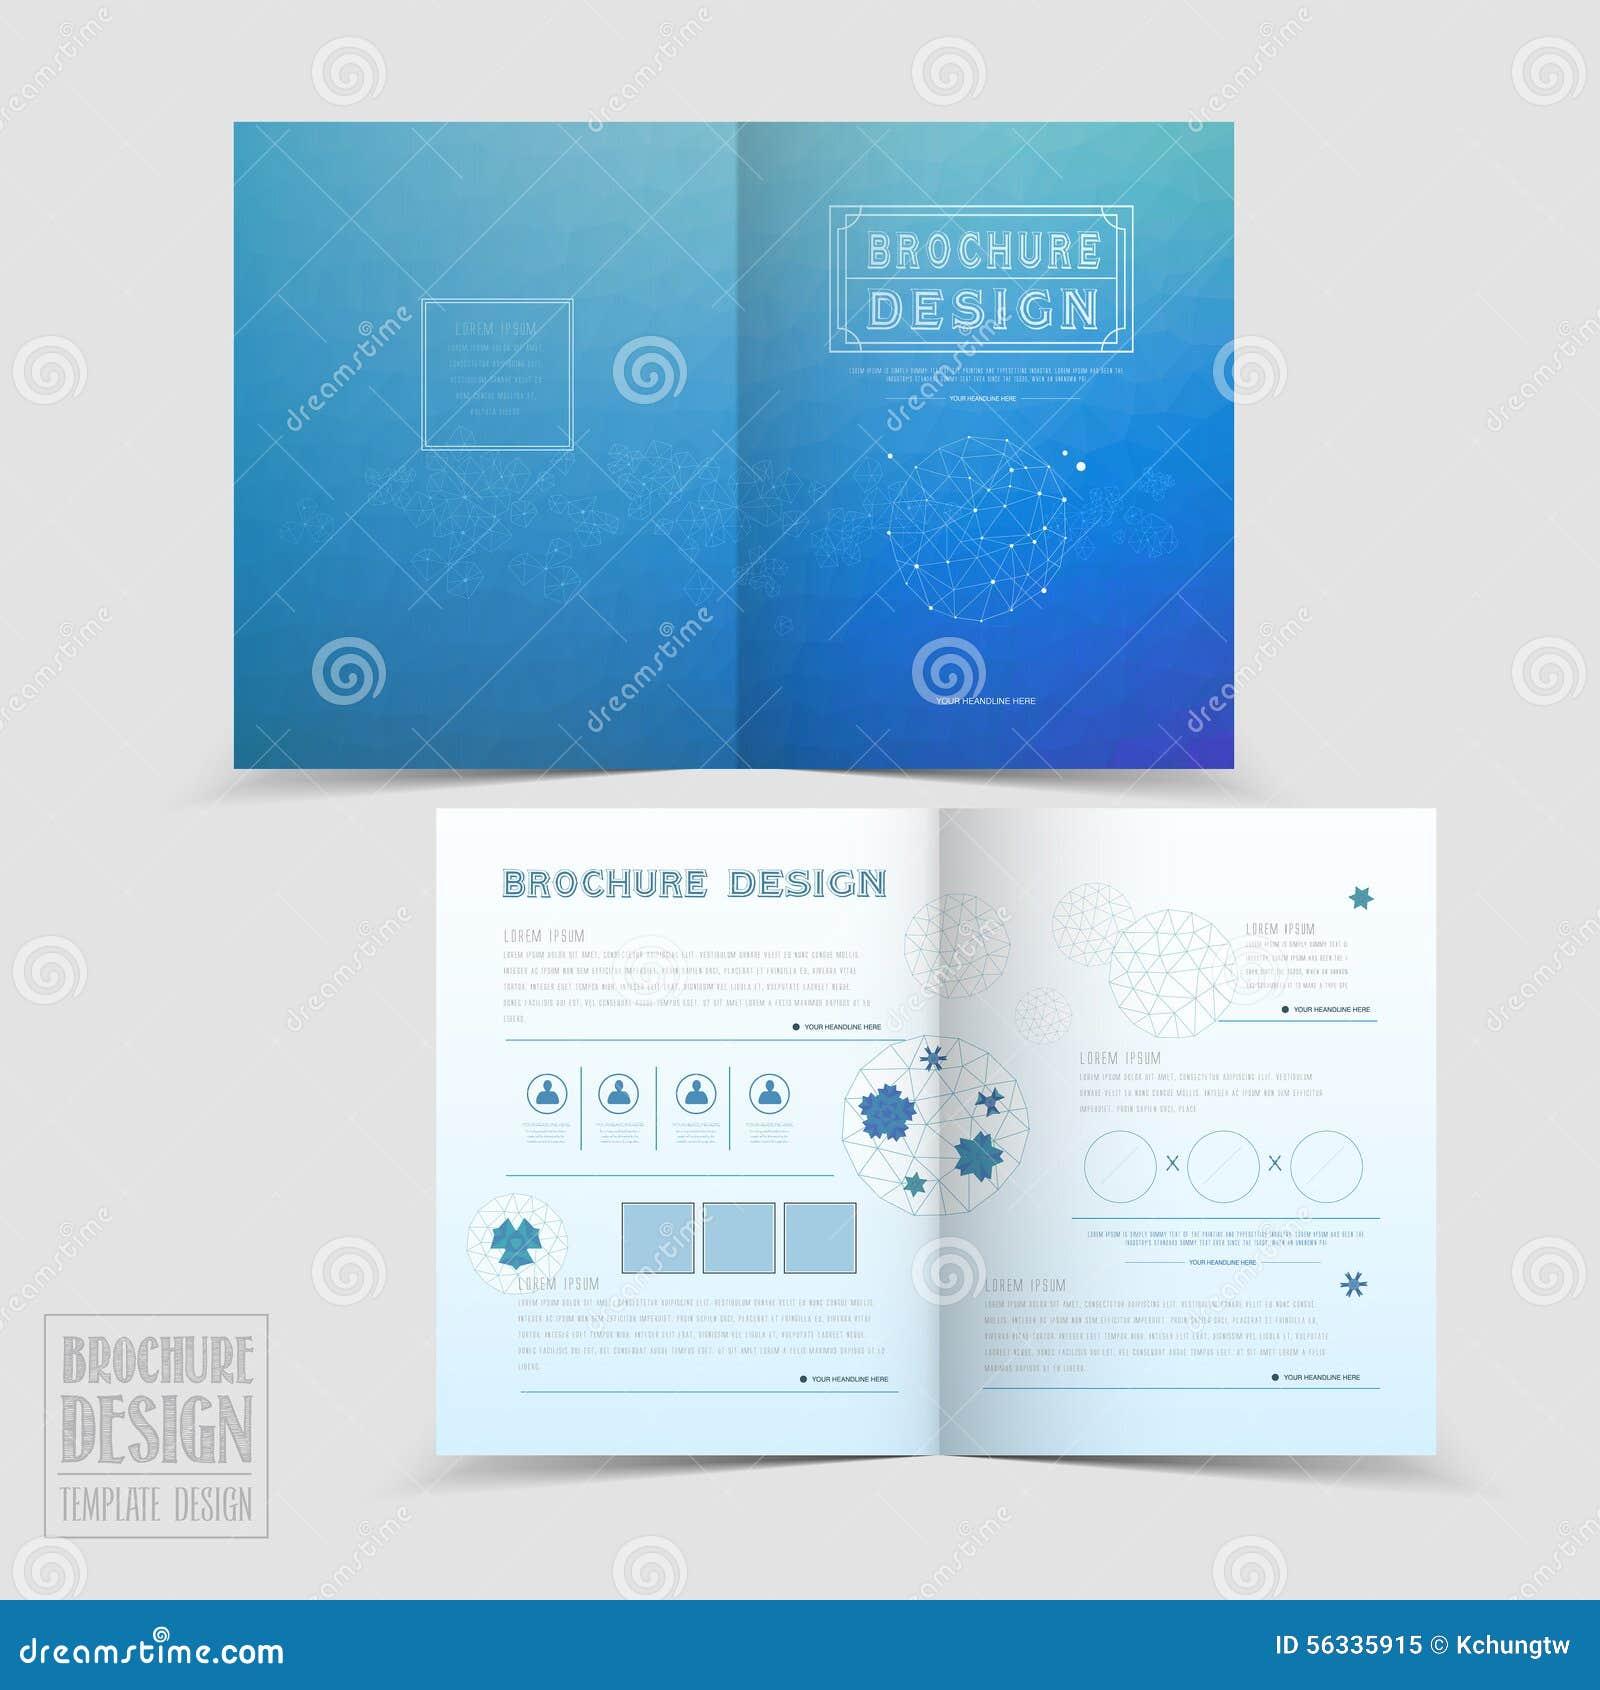 simplicity half fold brochure template design stock vector image 56335915. Black Bedroom Furniture Sets. Home Design Ideas